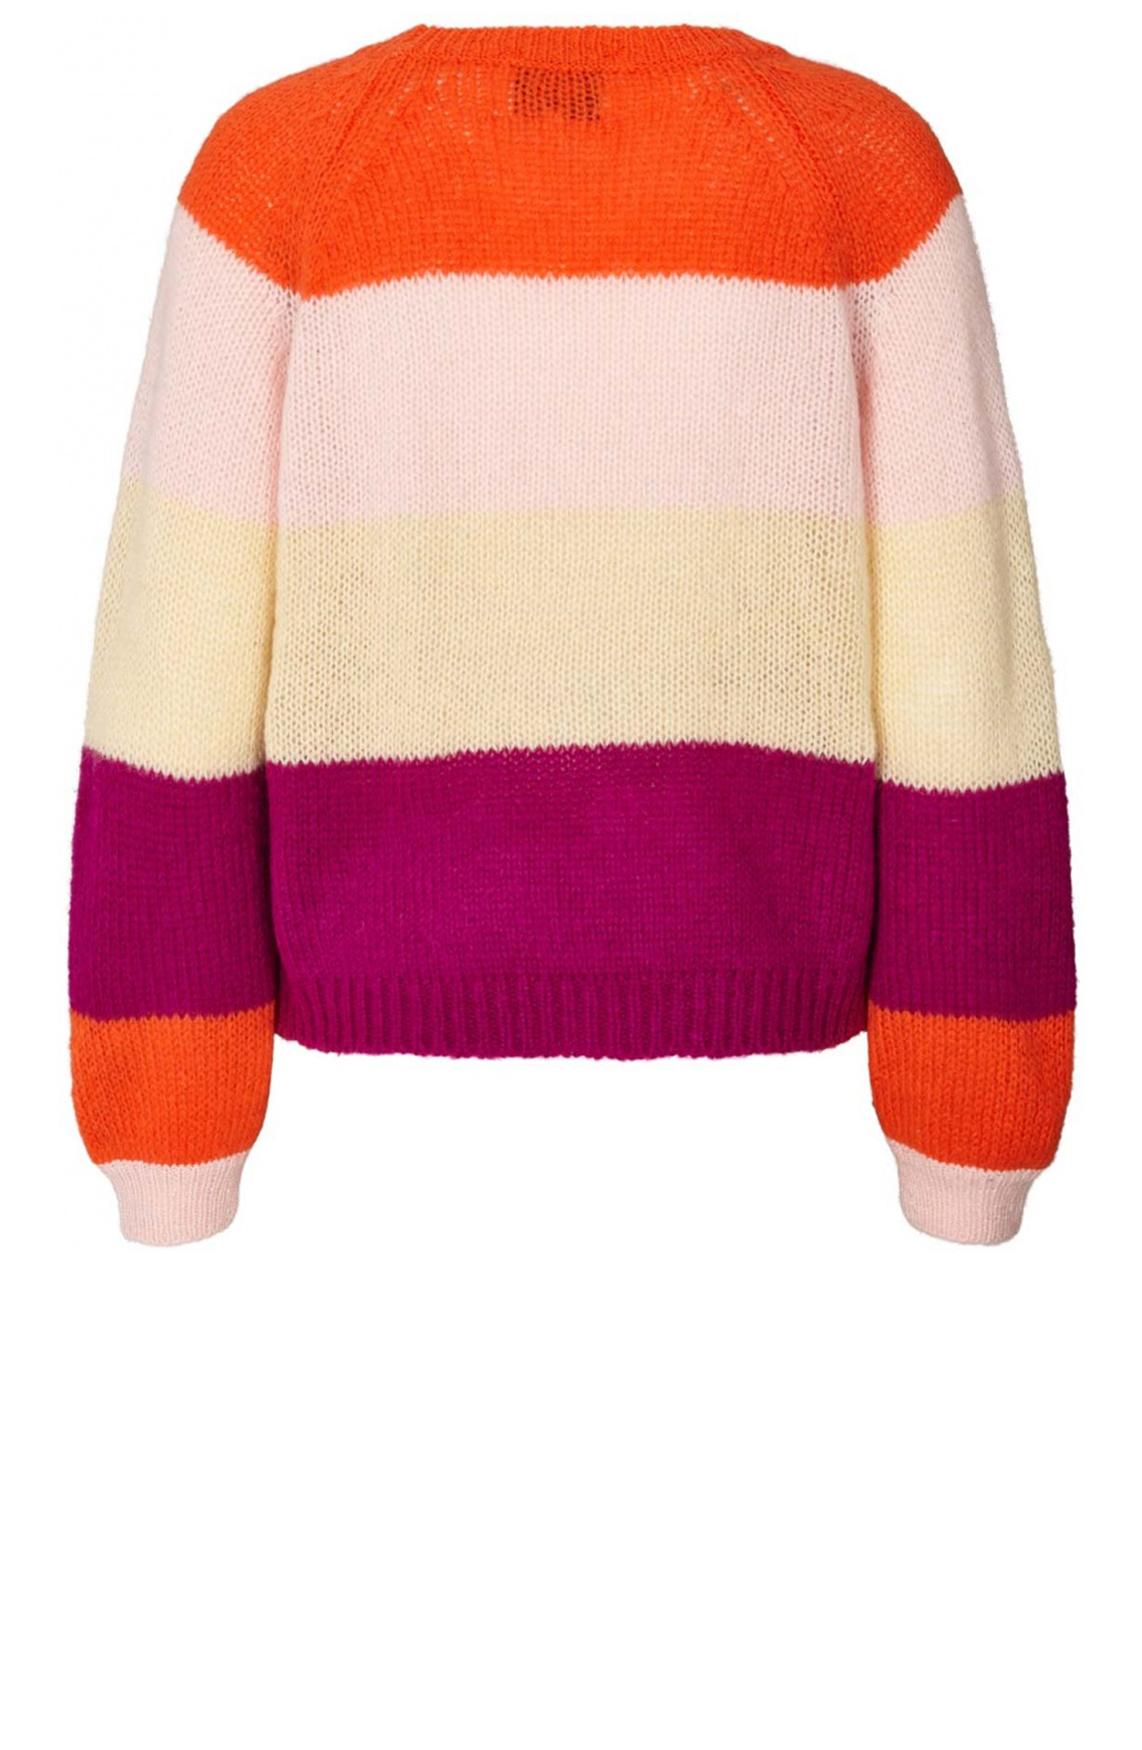 Lollys Laundry Dames Lana Jumper pullover Oranje